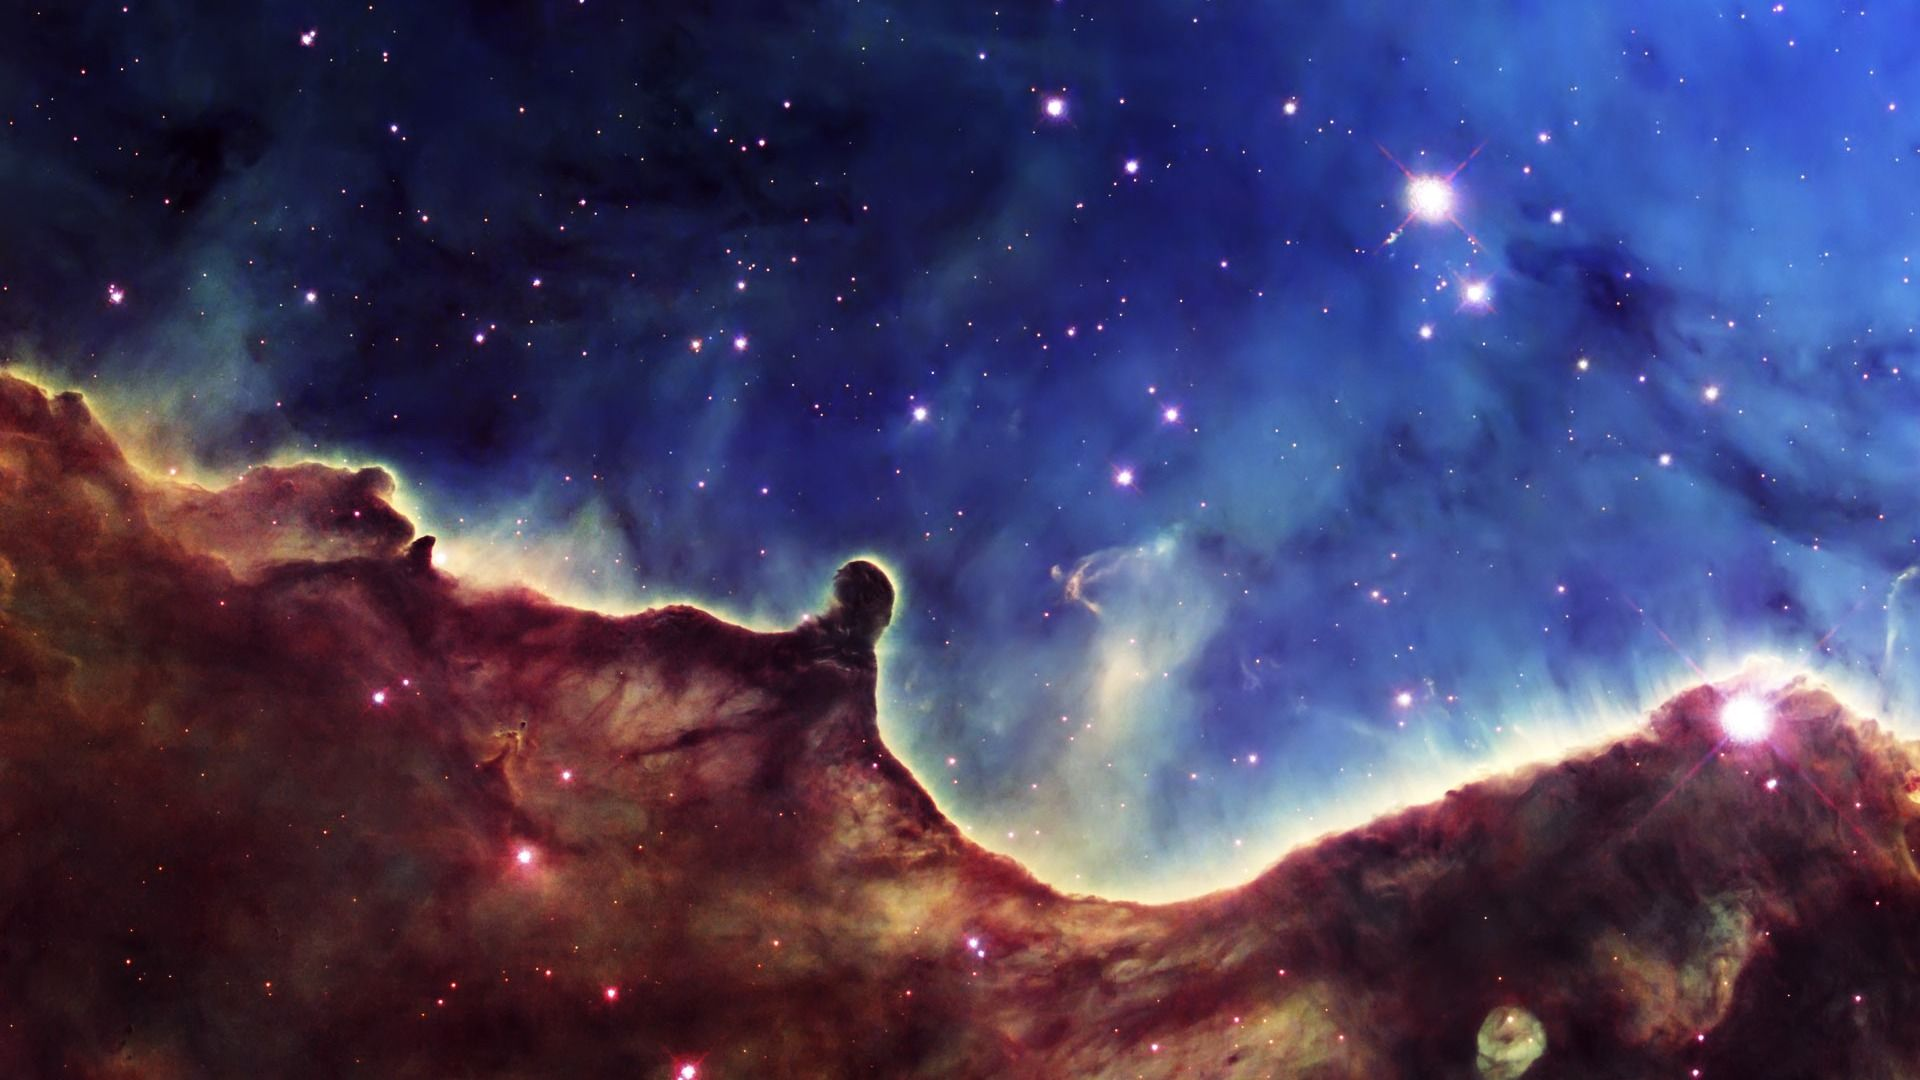 Hubble Star Wallpaper 3 8   1920x1080 Wallpaper Download 1920x1080